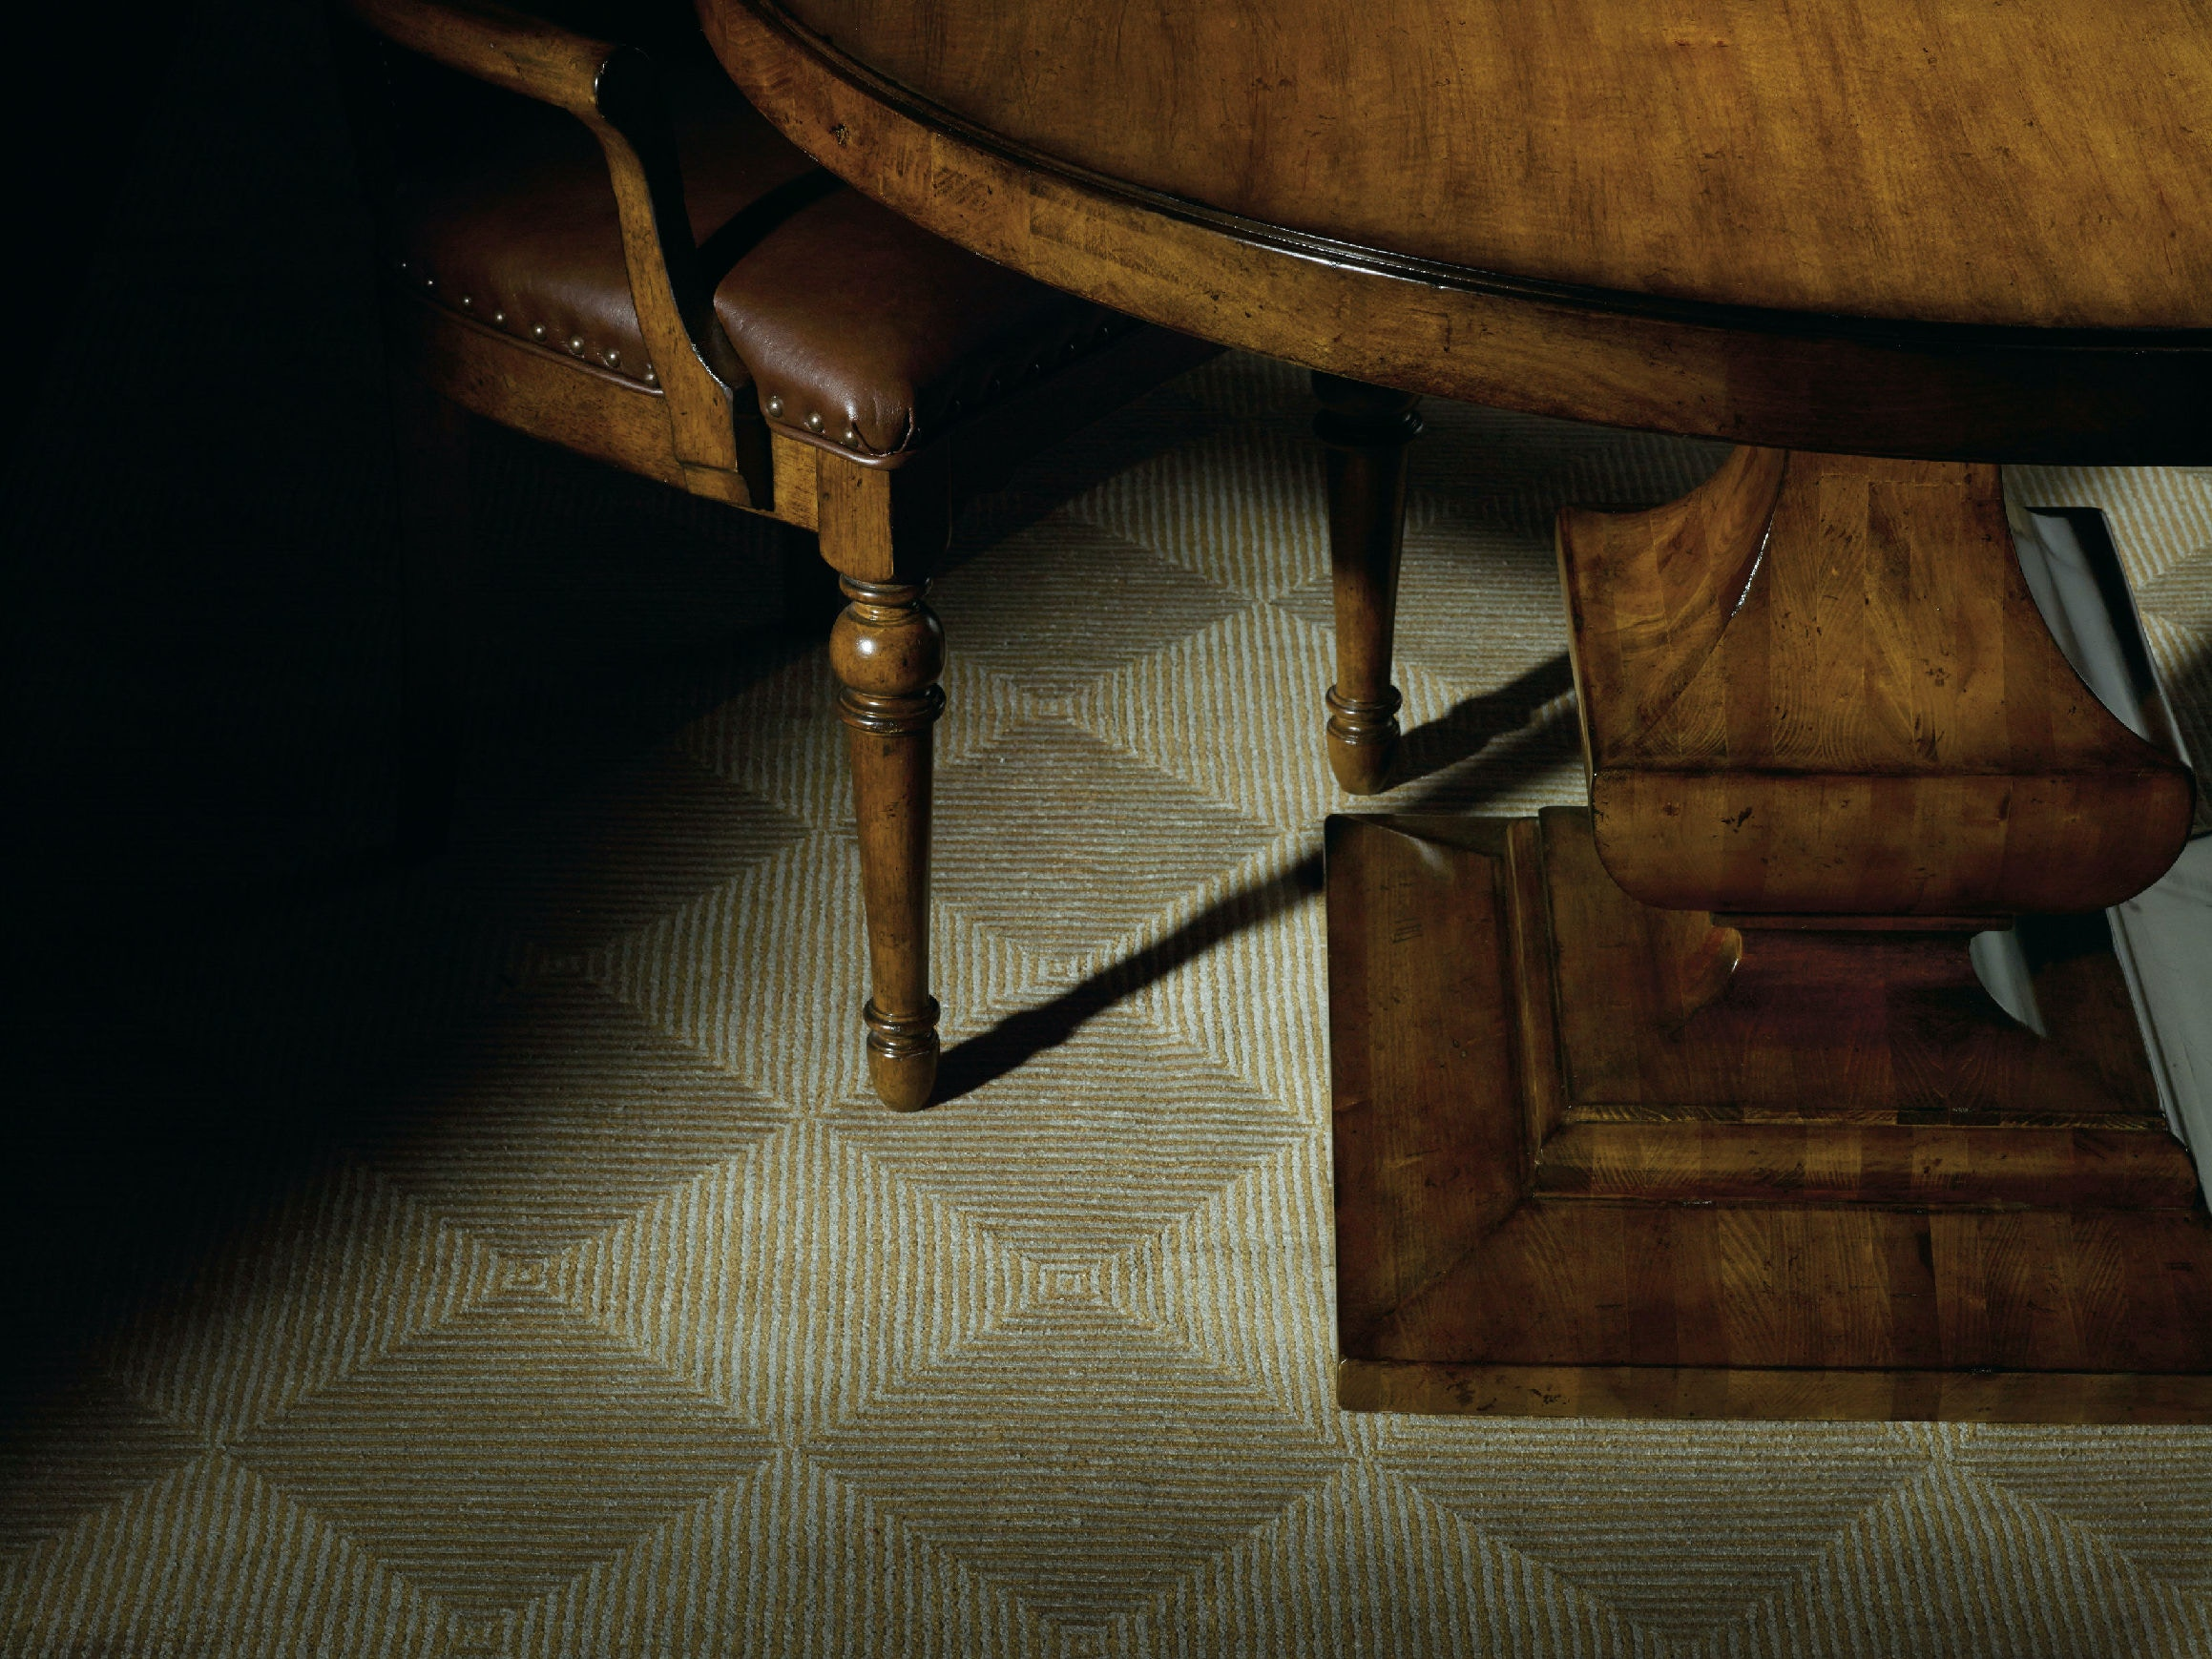 hooker furniture tynecastle round pedestal dining table